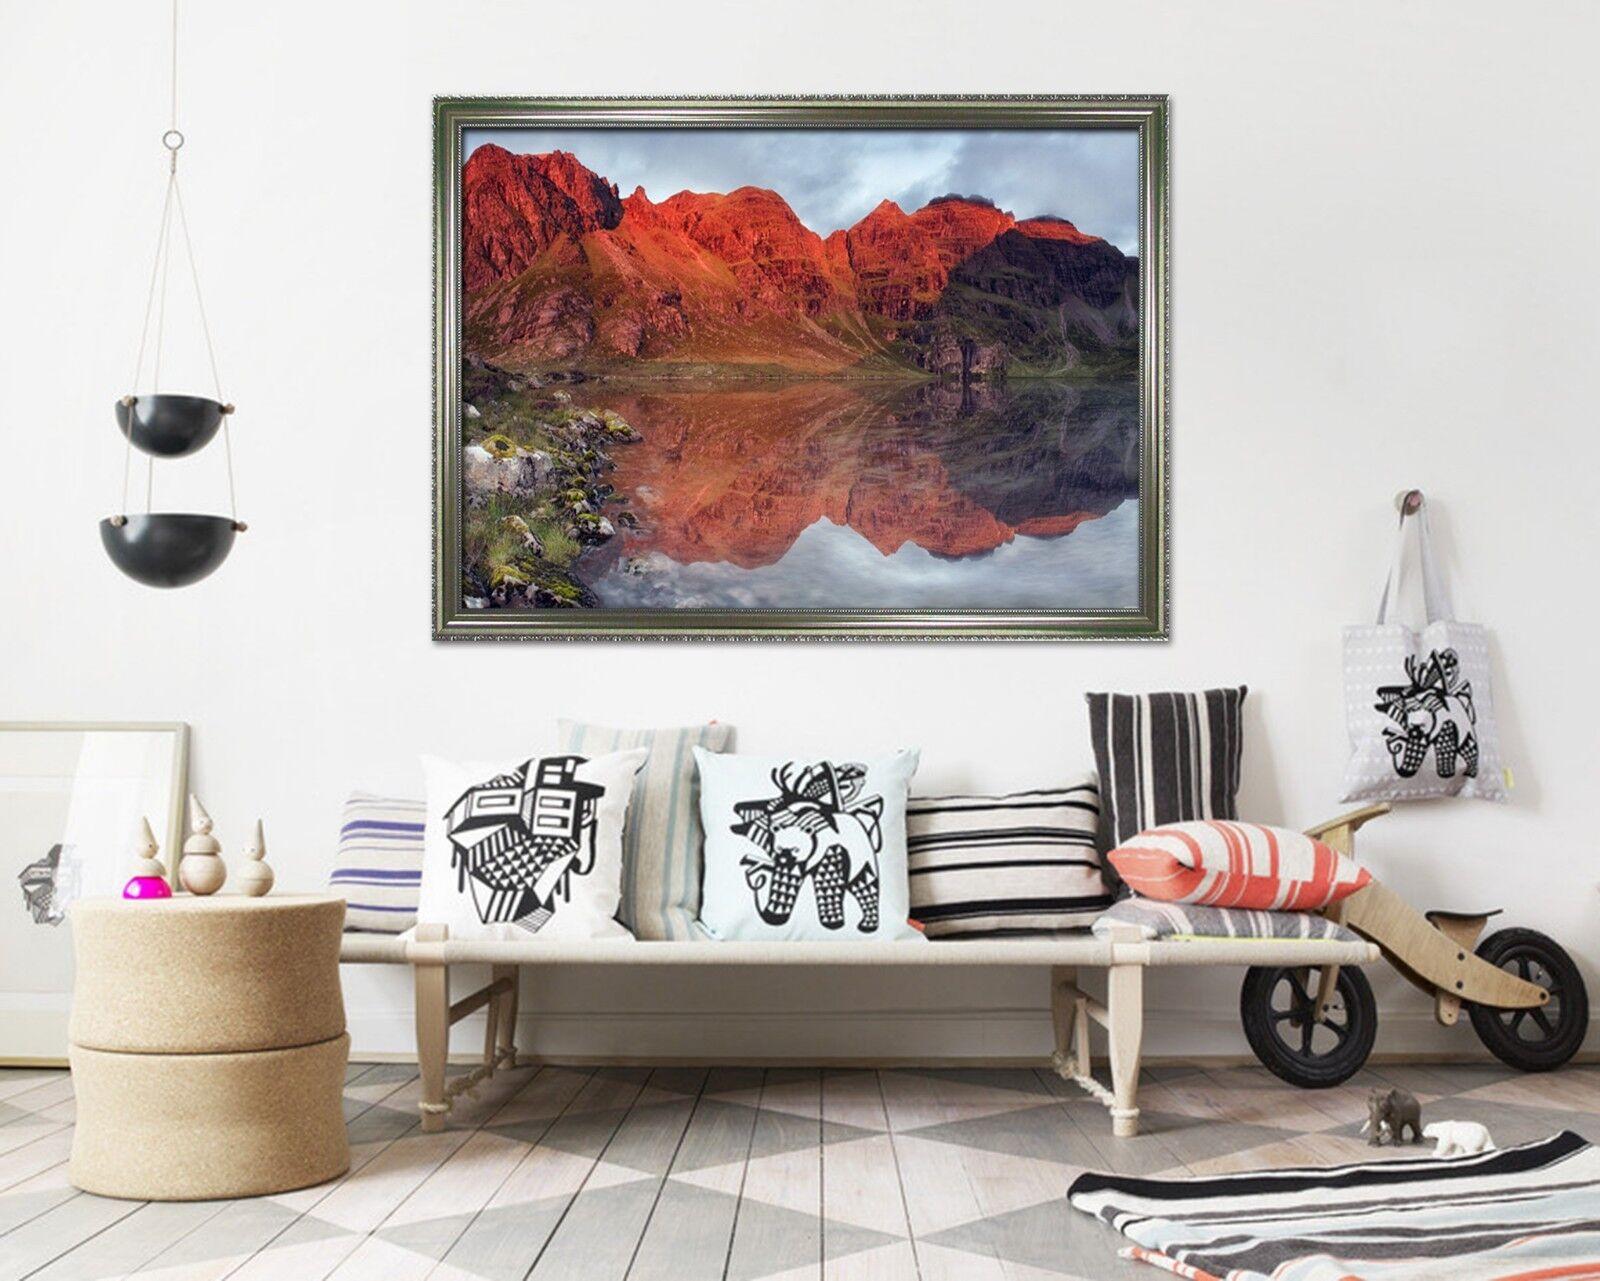 3D Rojo Lago De Montaña 2 Póster Enmarcado Decoración del Hogar Pintura de Impresión Arte AJ Wallpaper